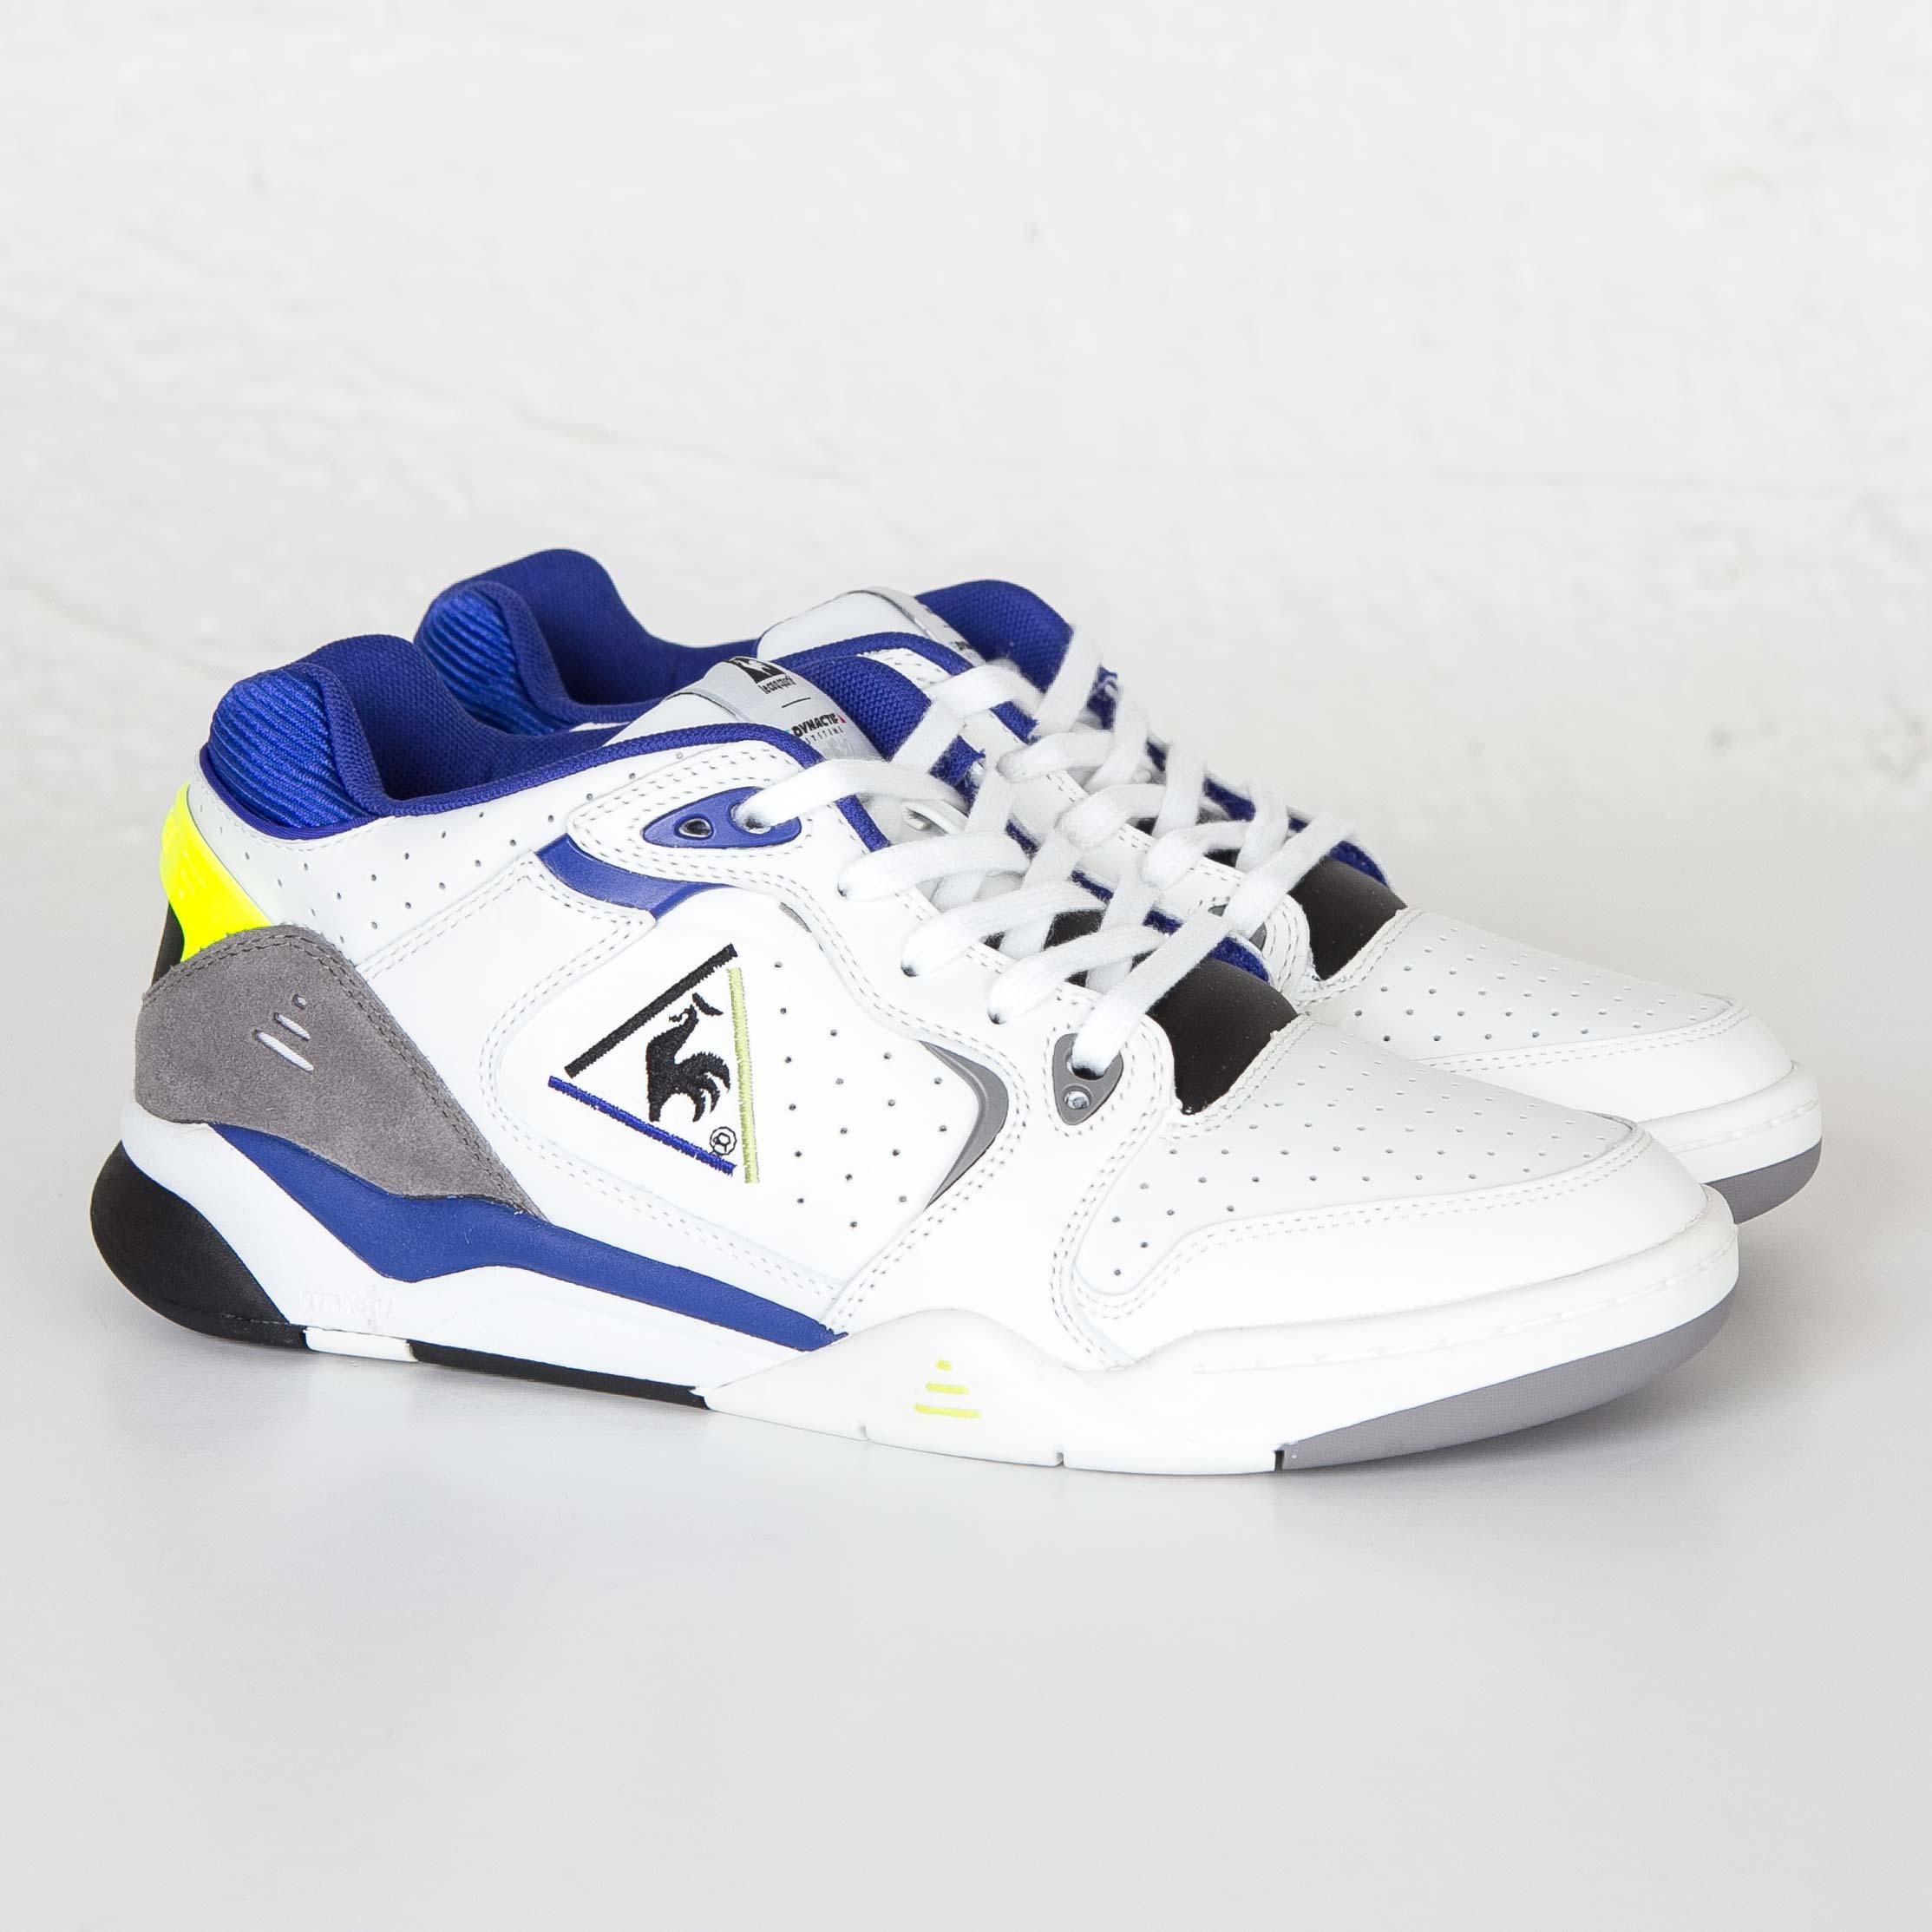 2556189e1baf Le Coq Sportif LCS T4000 OG - 1610694 - Sneakersnstuff